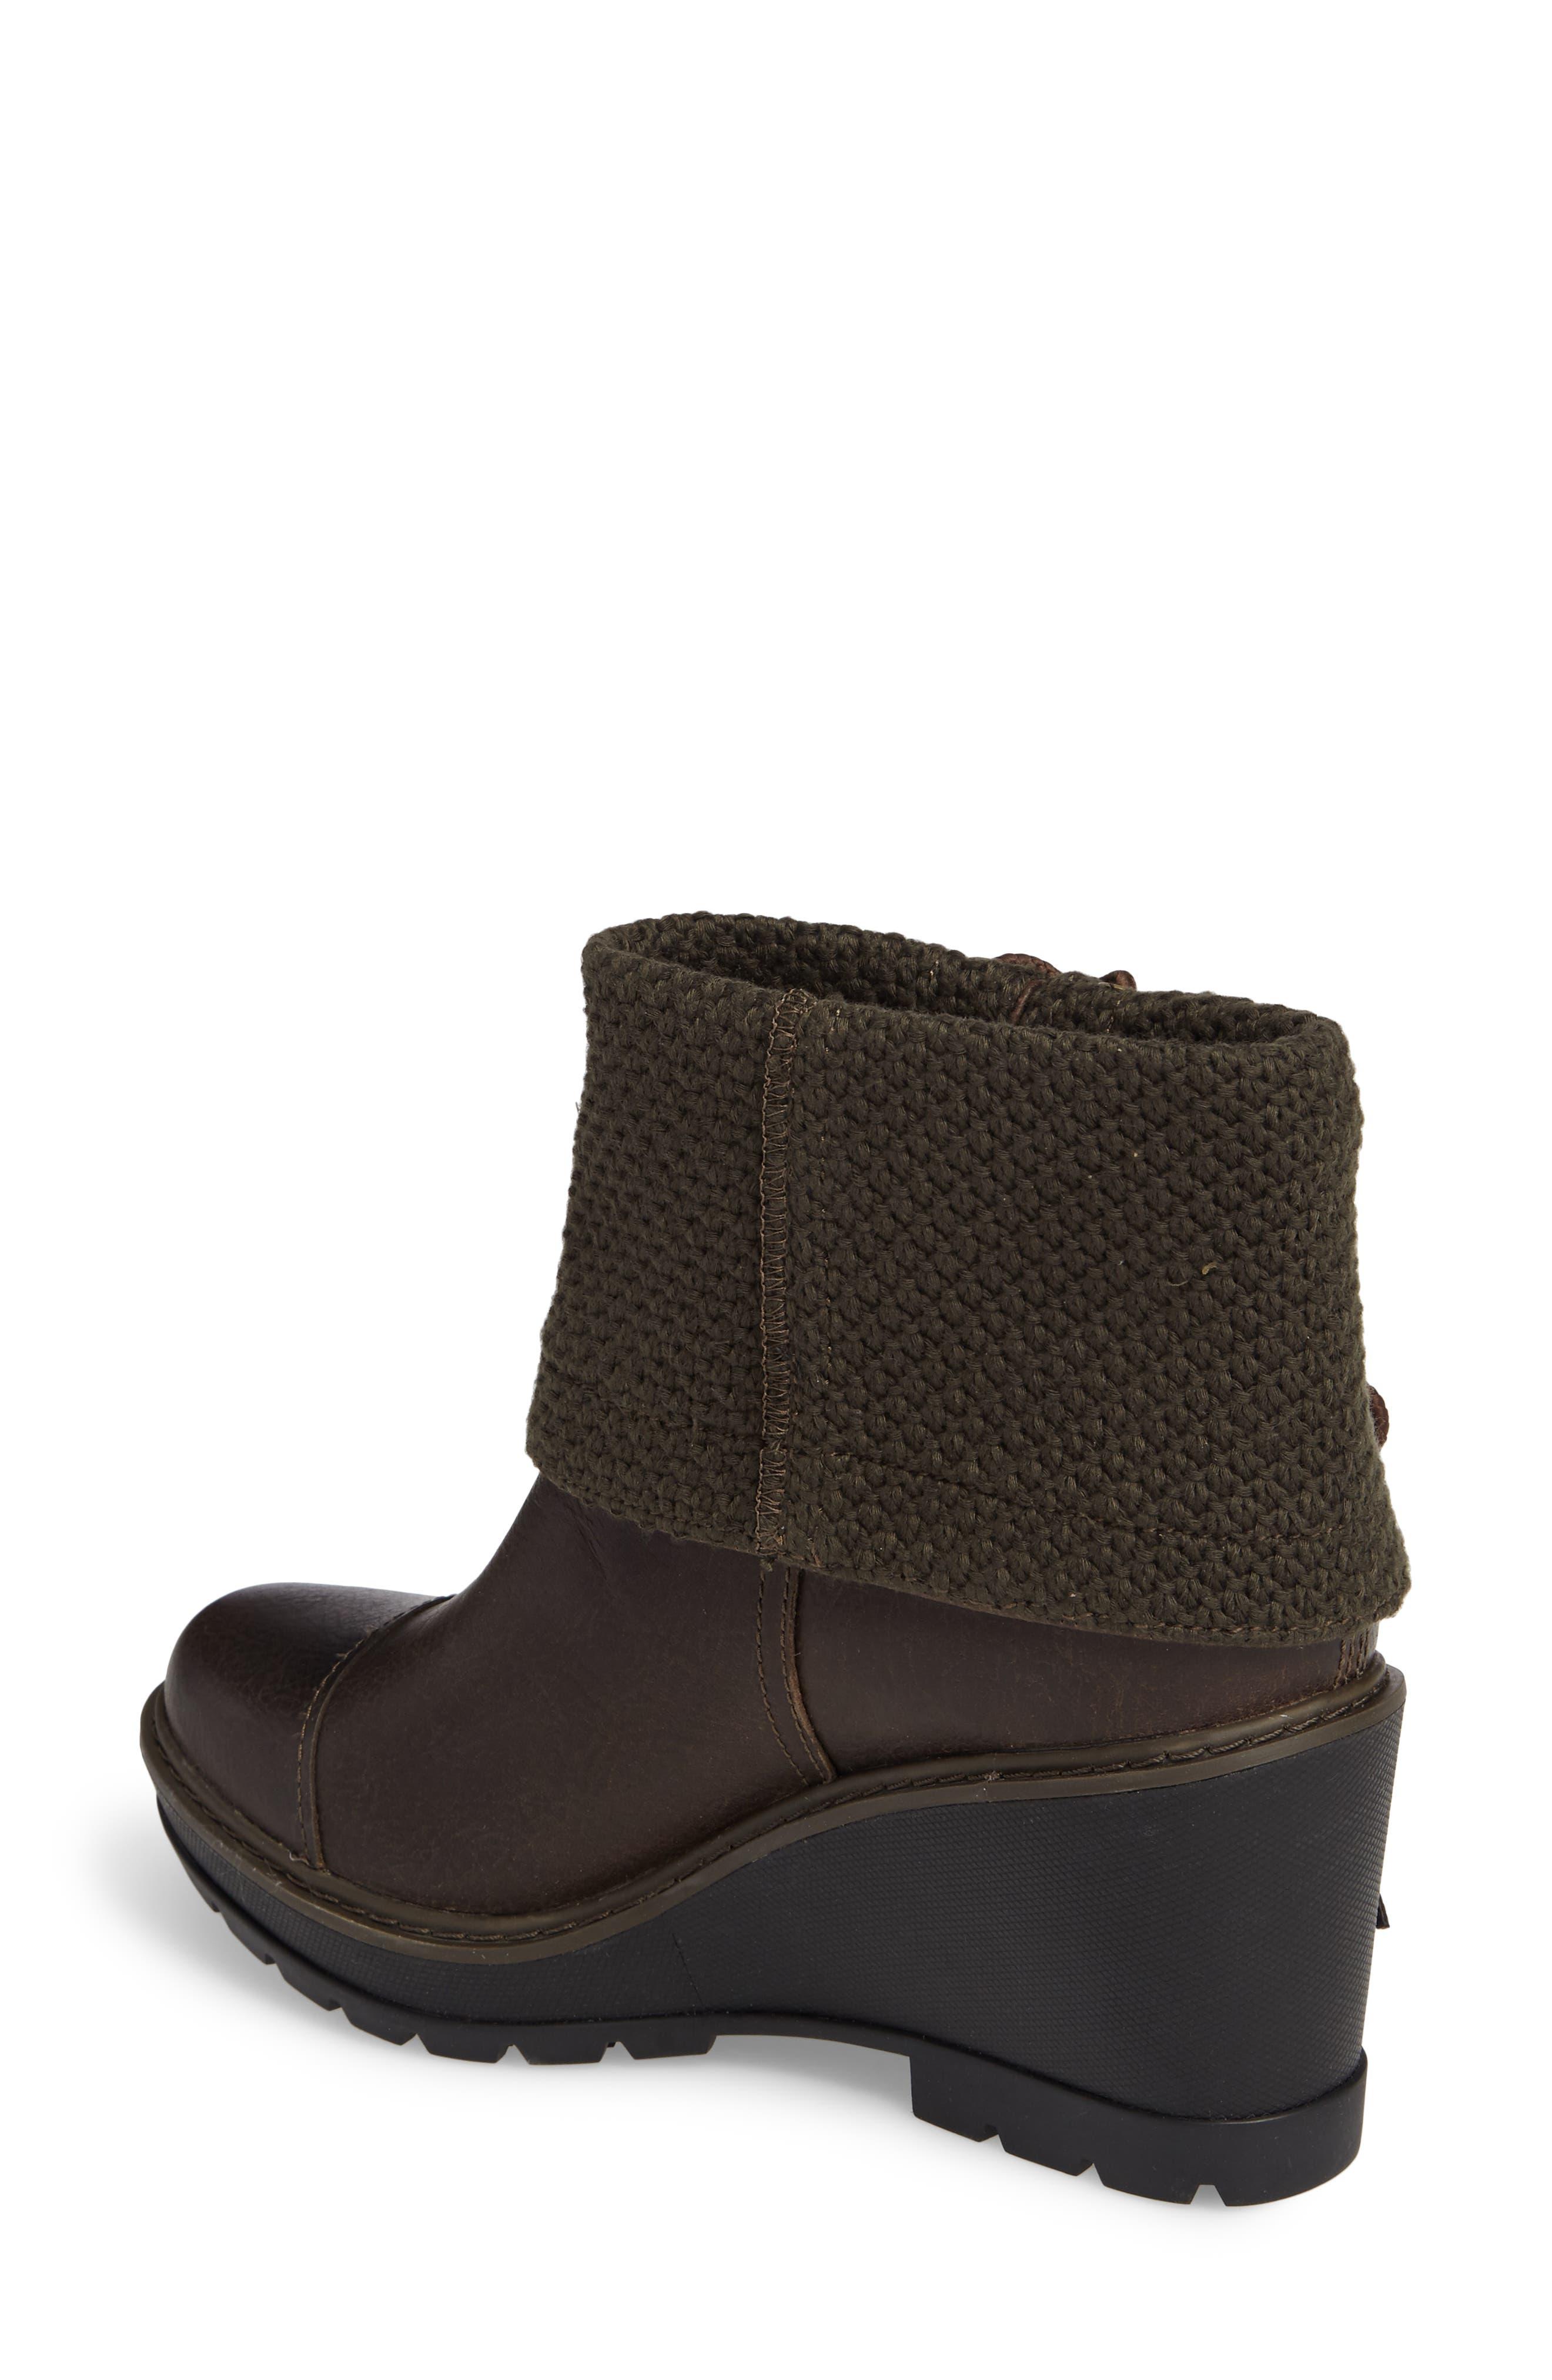 Kellis Fold Down Water Resistant Boot,                             Alternate thumbnail 4, color,